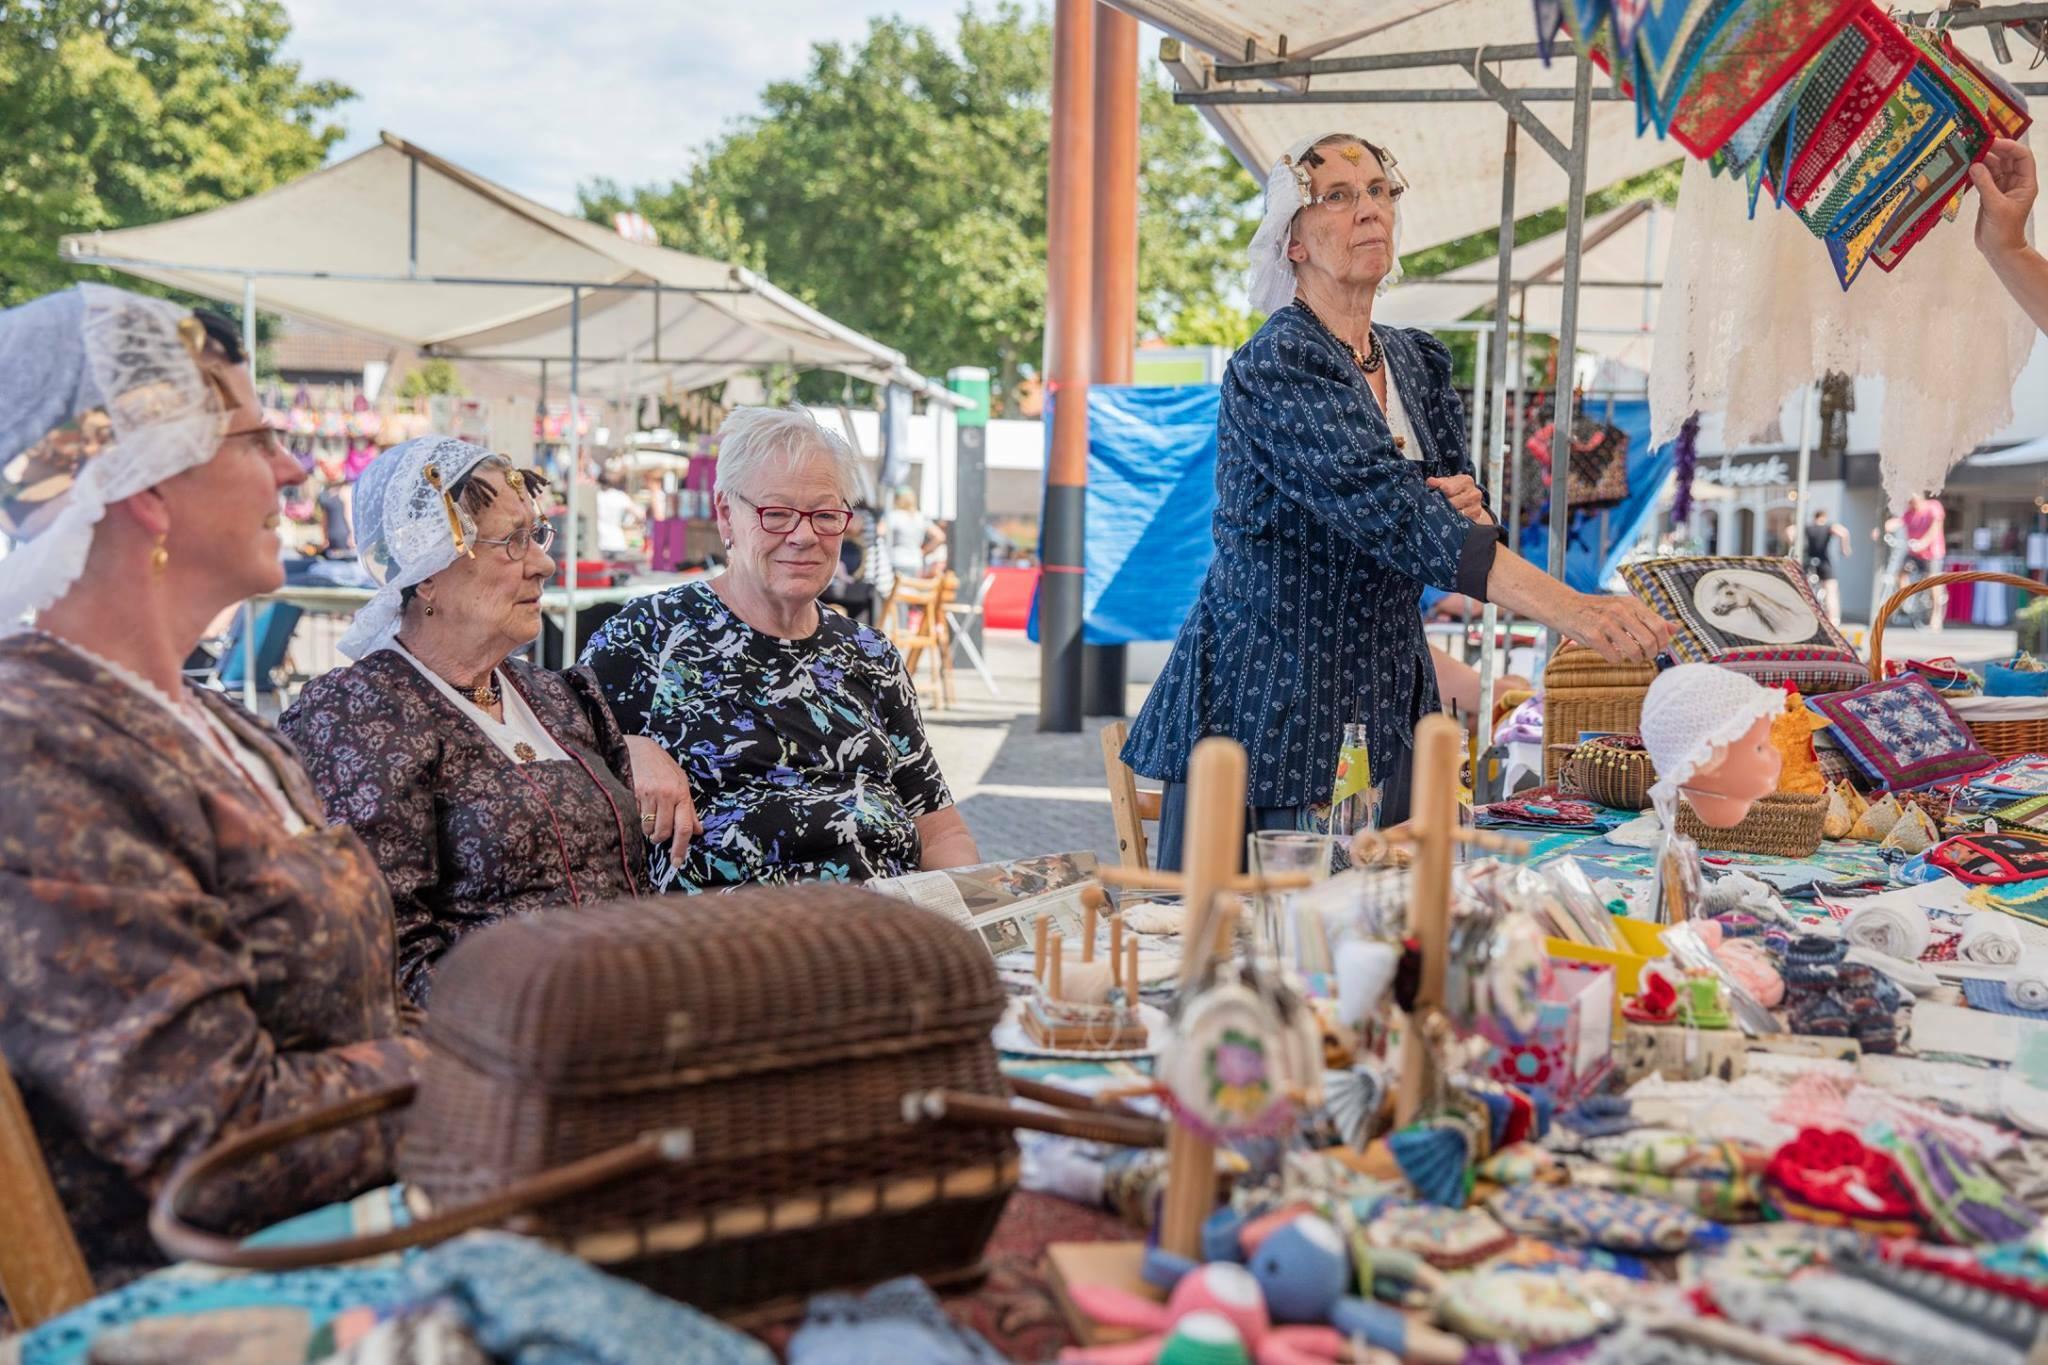 Vrouwen in klederdracht zomermarkt Den Burg VVV Texel